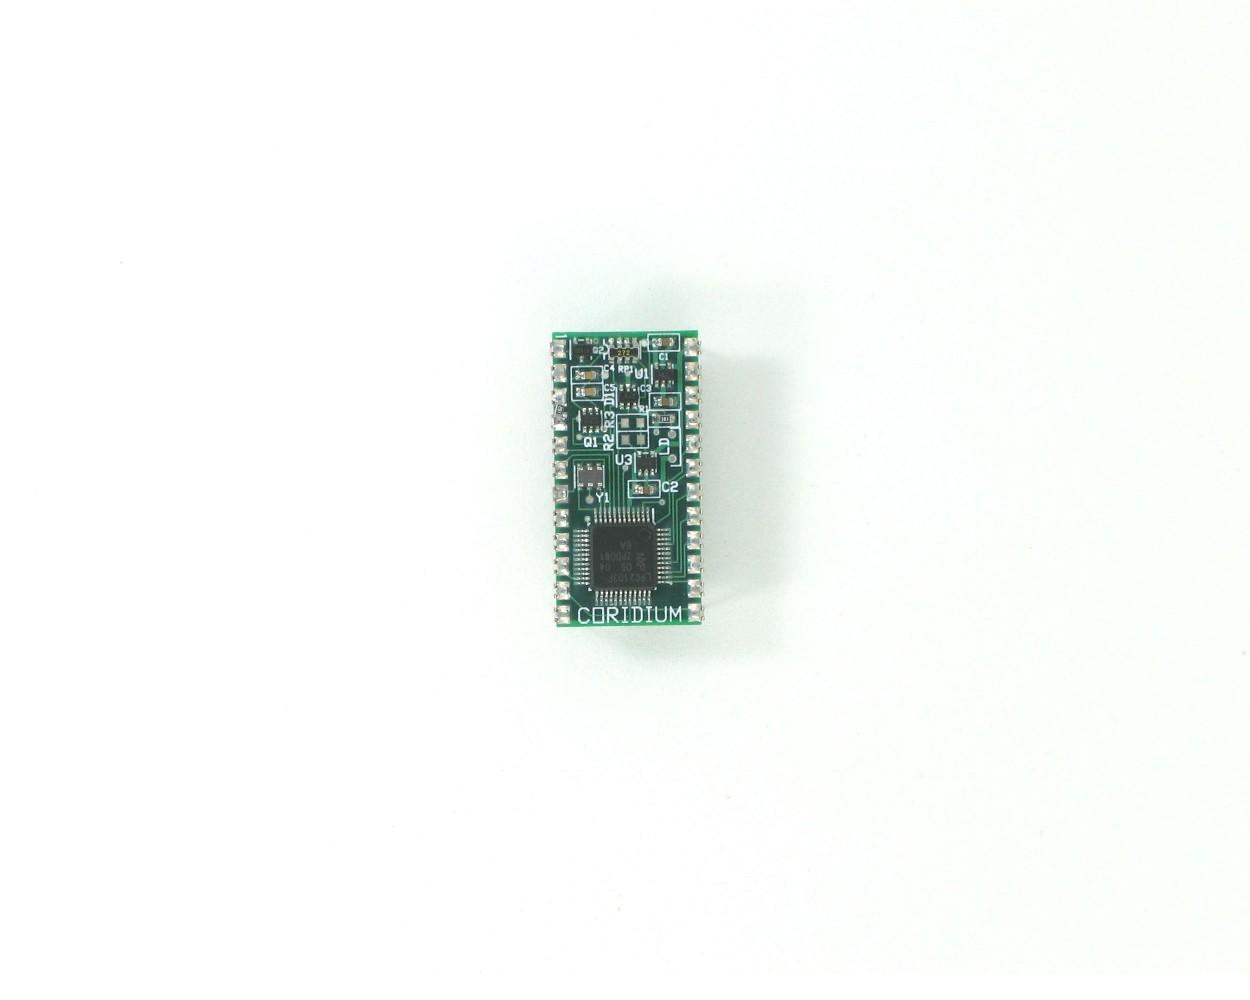 Coridium ARMexpress Lite 0